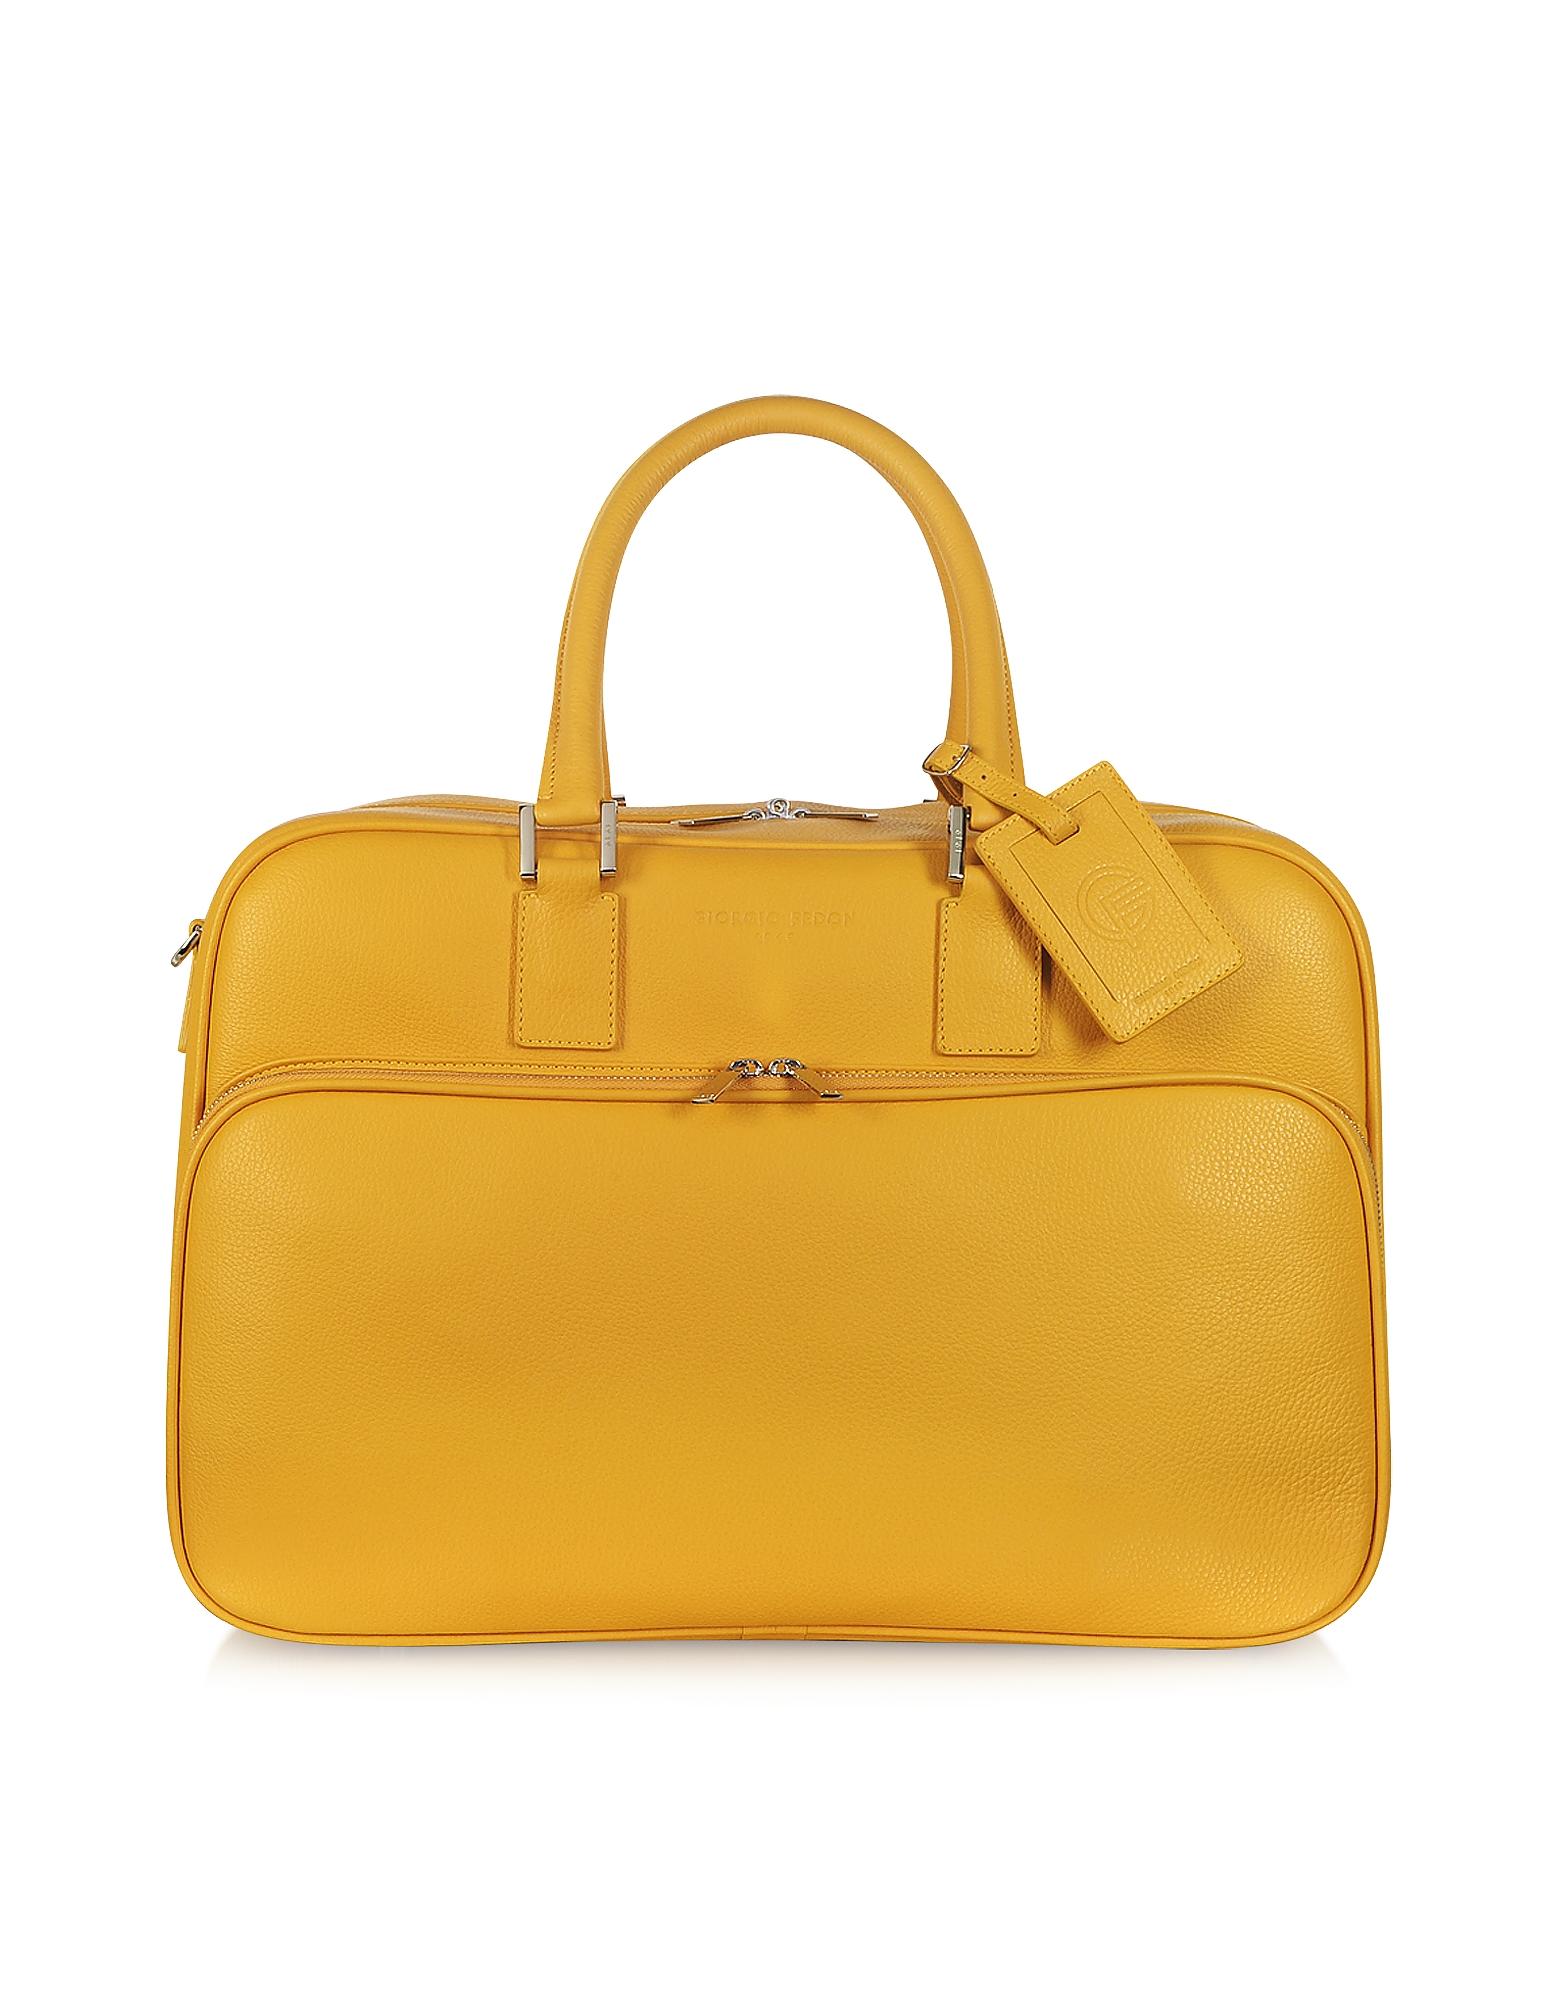 Travel-Bag - Желтая Кожаная Сумка Ручная Кладь с Двумя Ручками